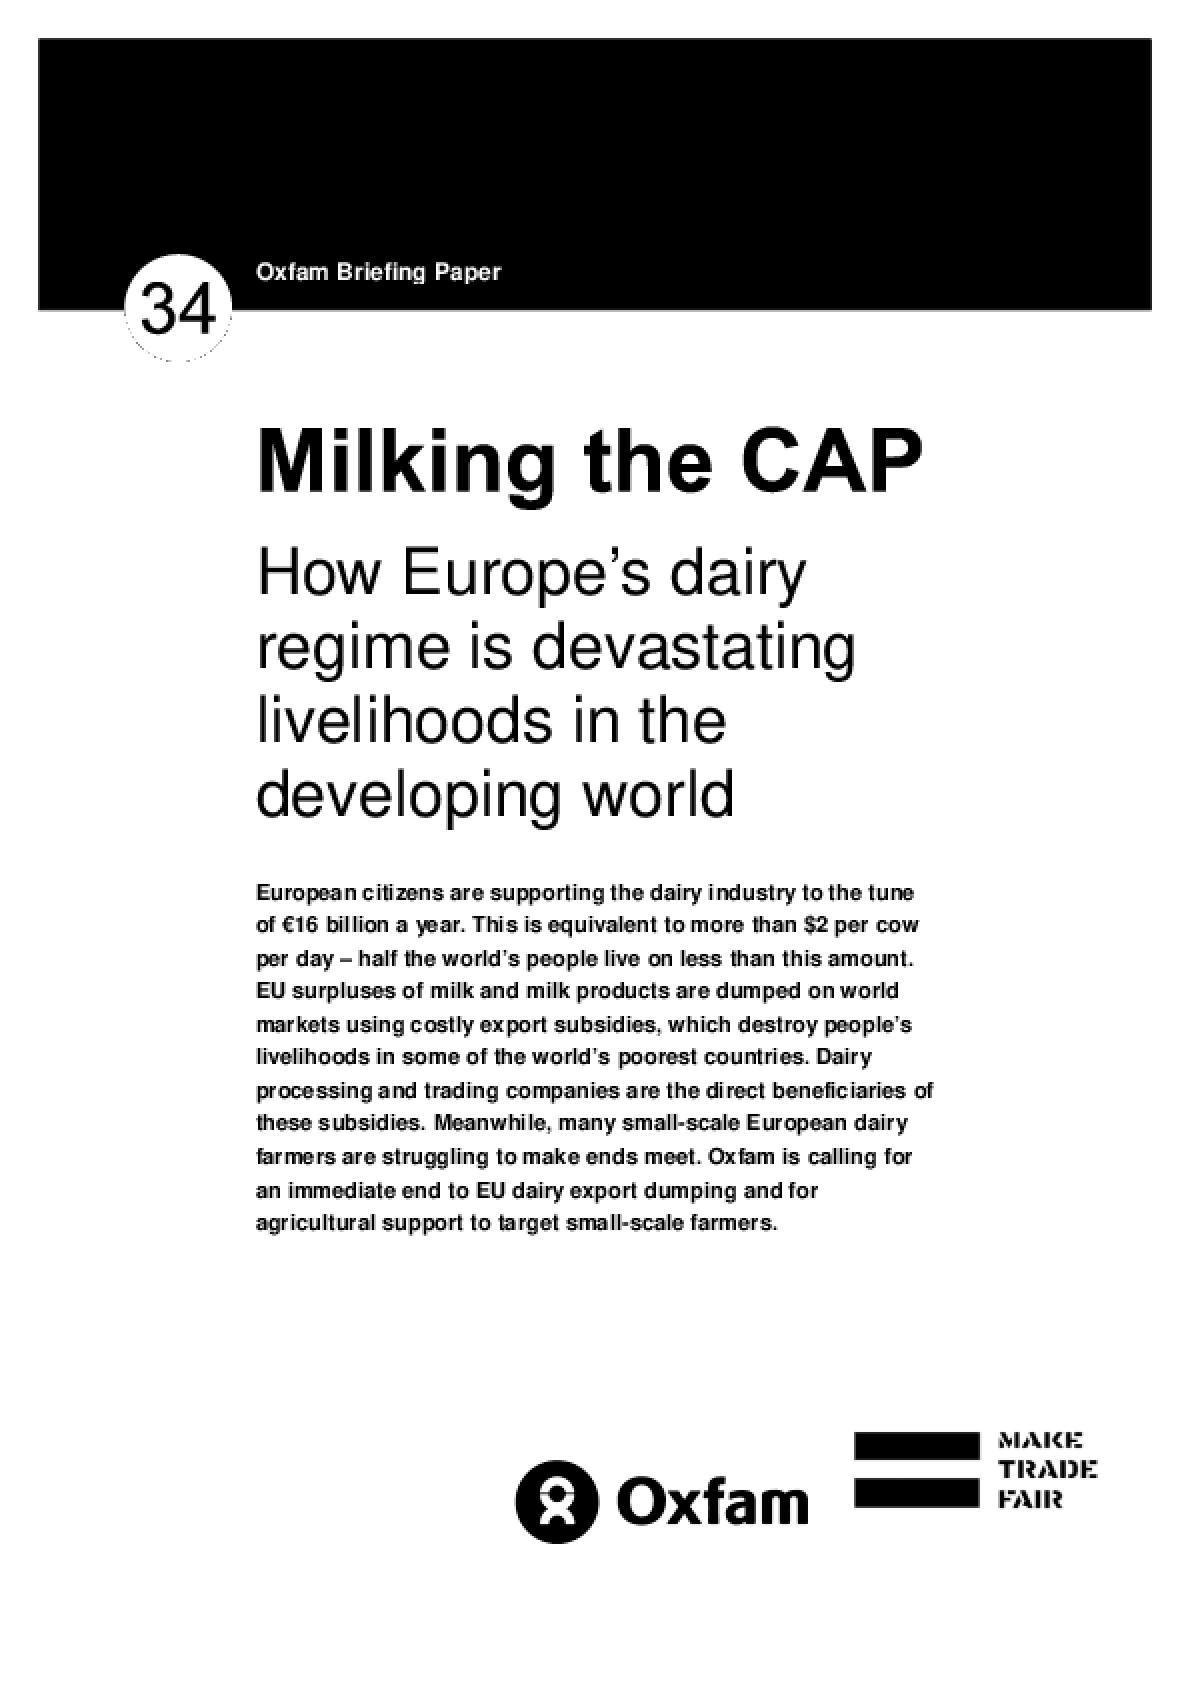 Milking the CAP: How Europe's dairy regime is devastating livelihoods in the developing world